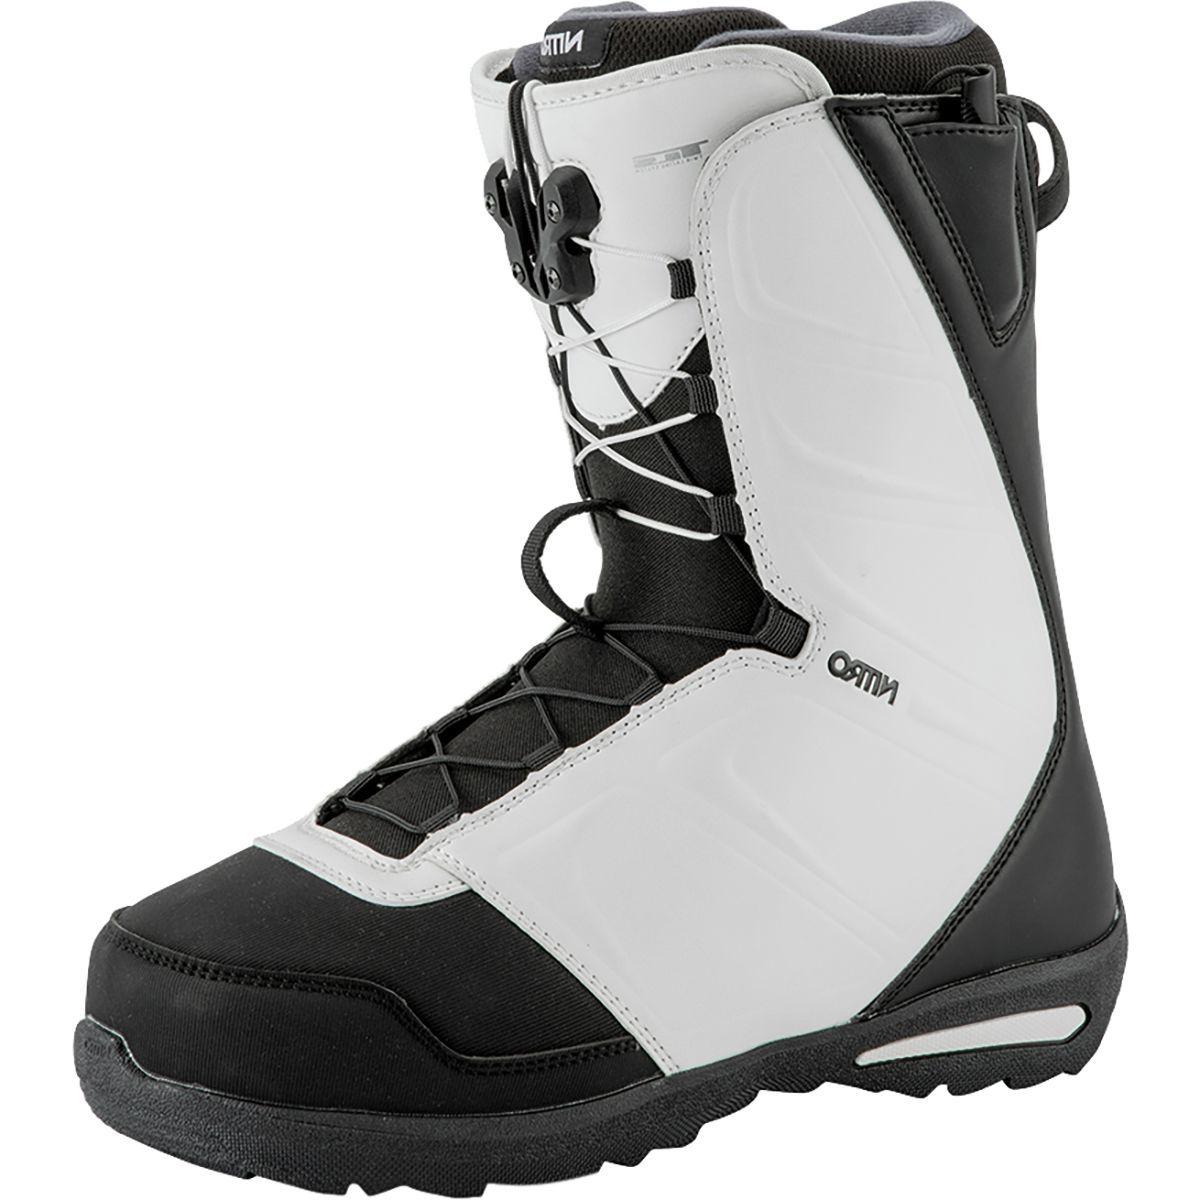 Nitro Vagabond TLS Snowboard Boot - Men's